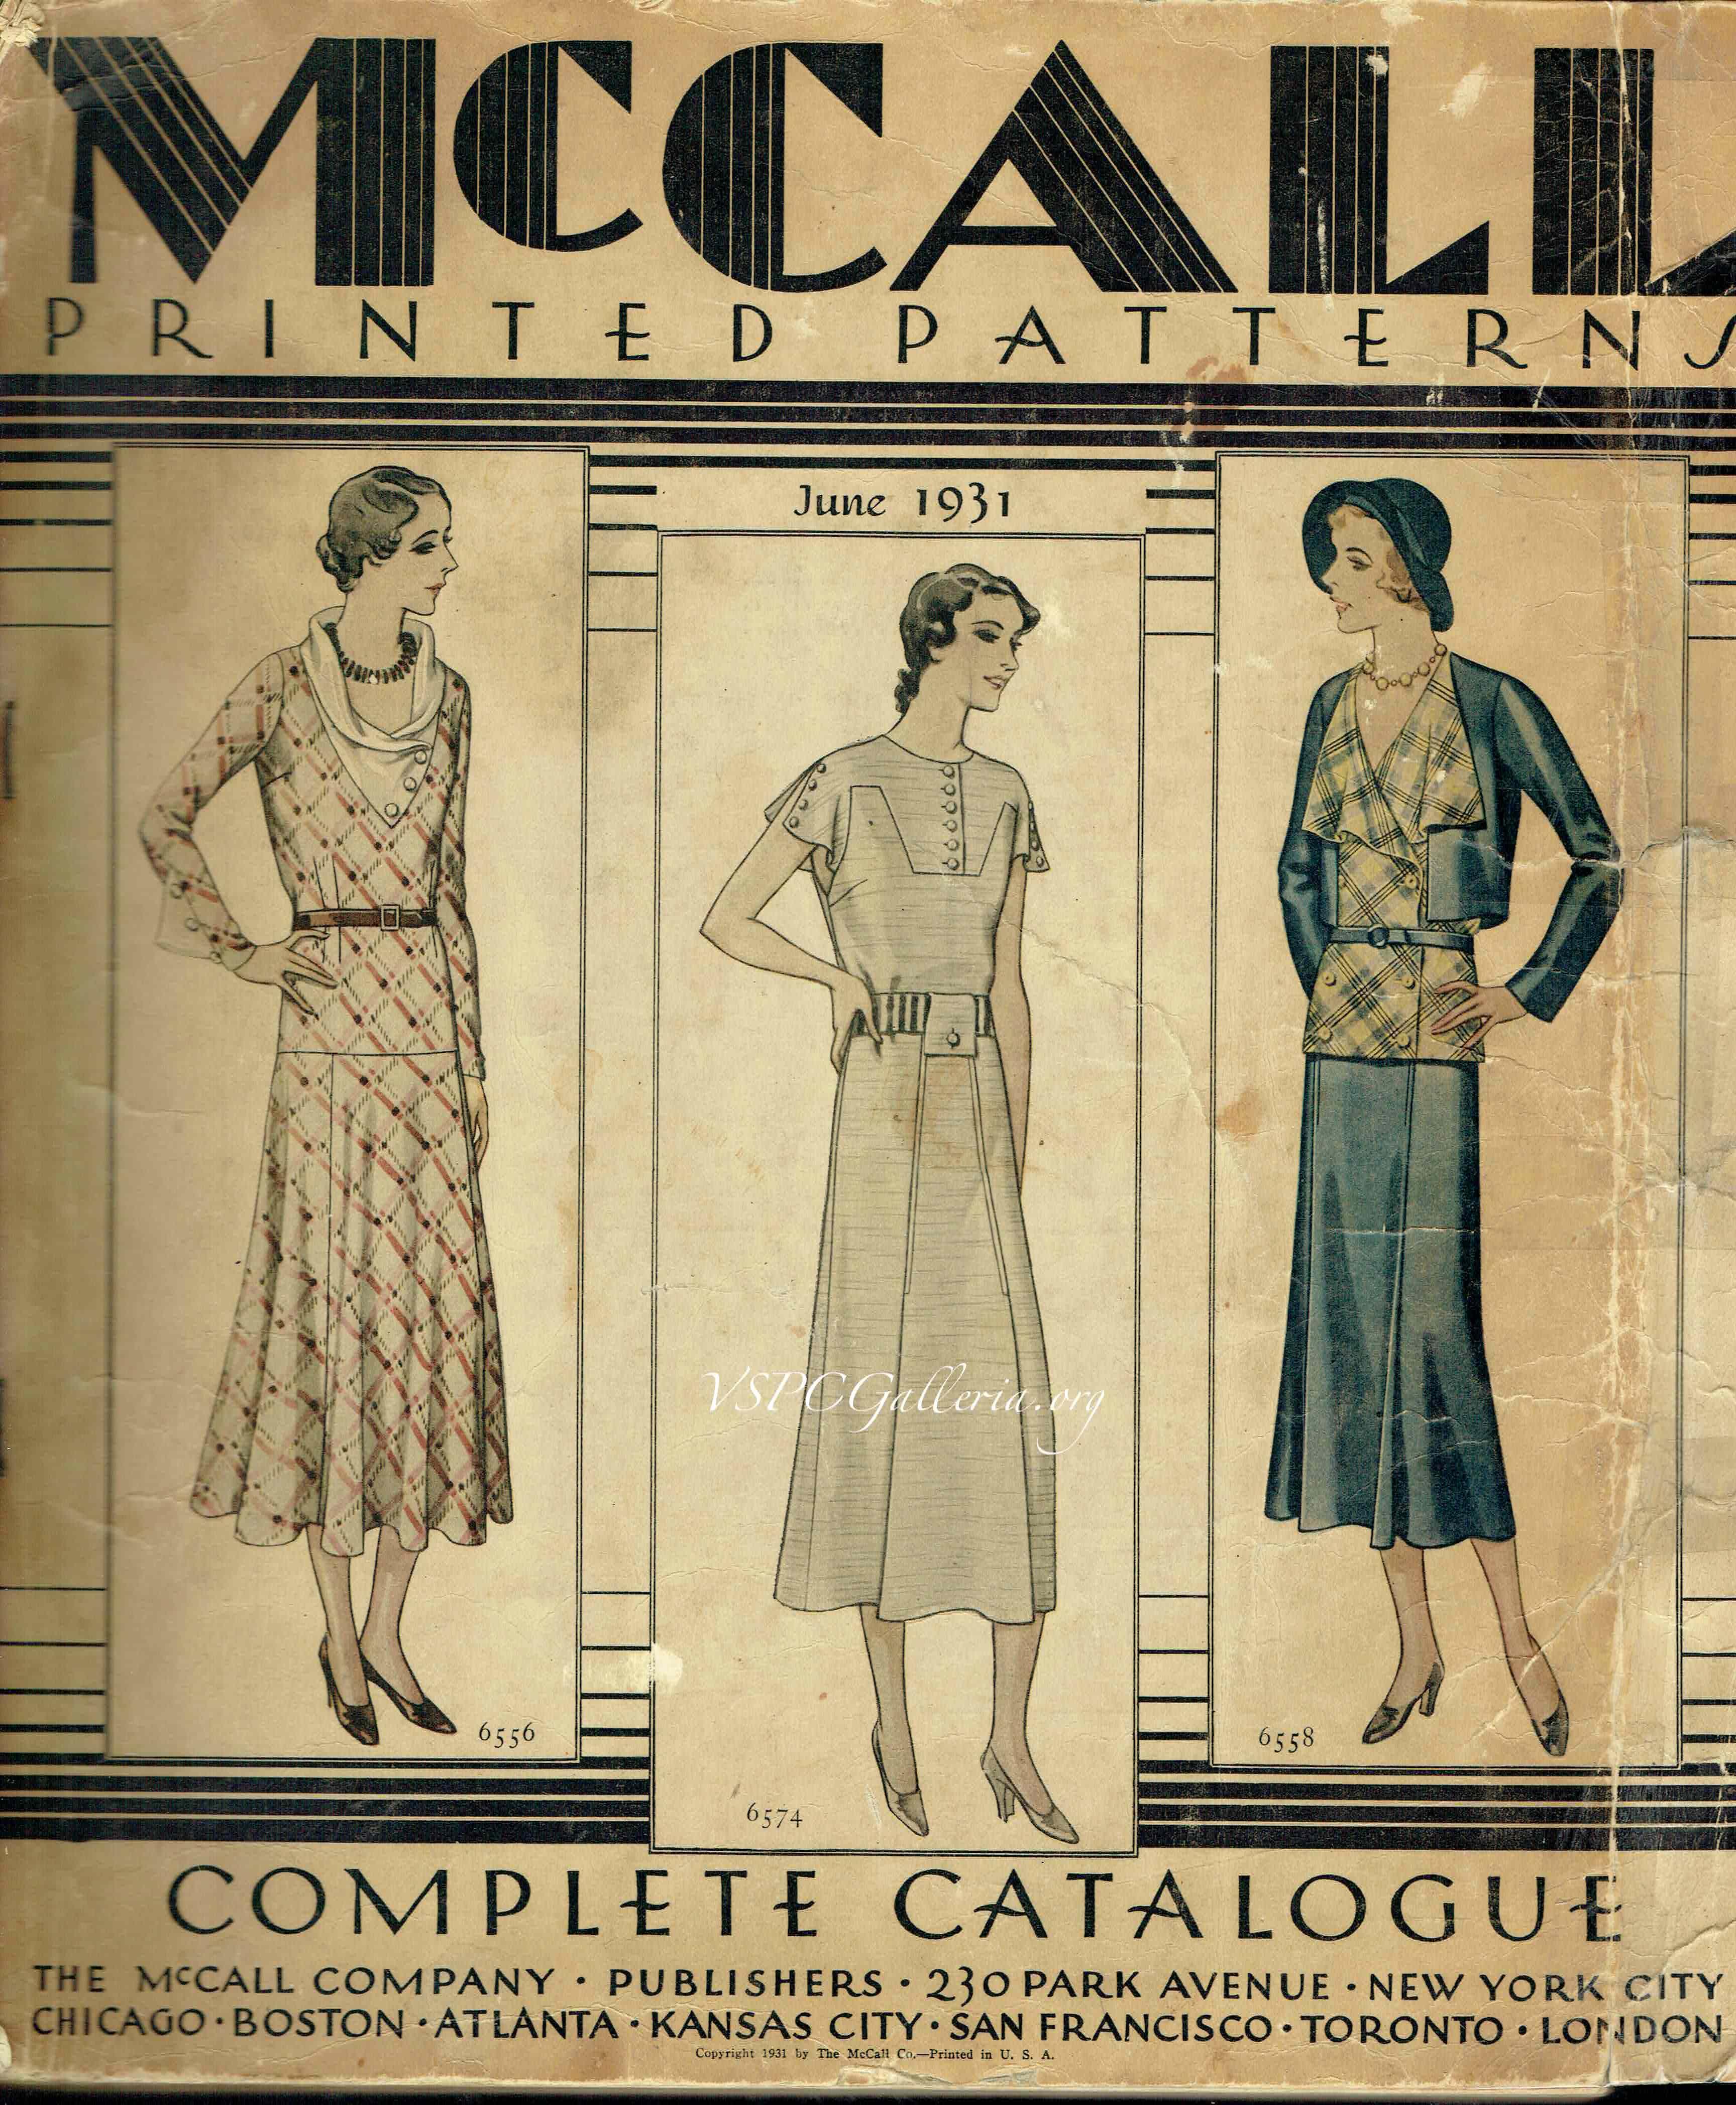 McCall Counter Catalog June 1931